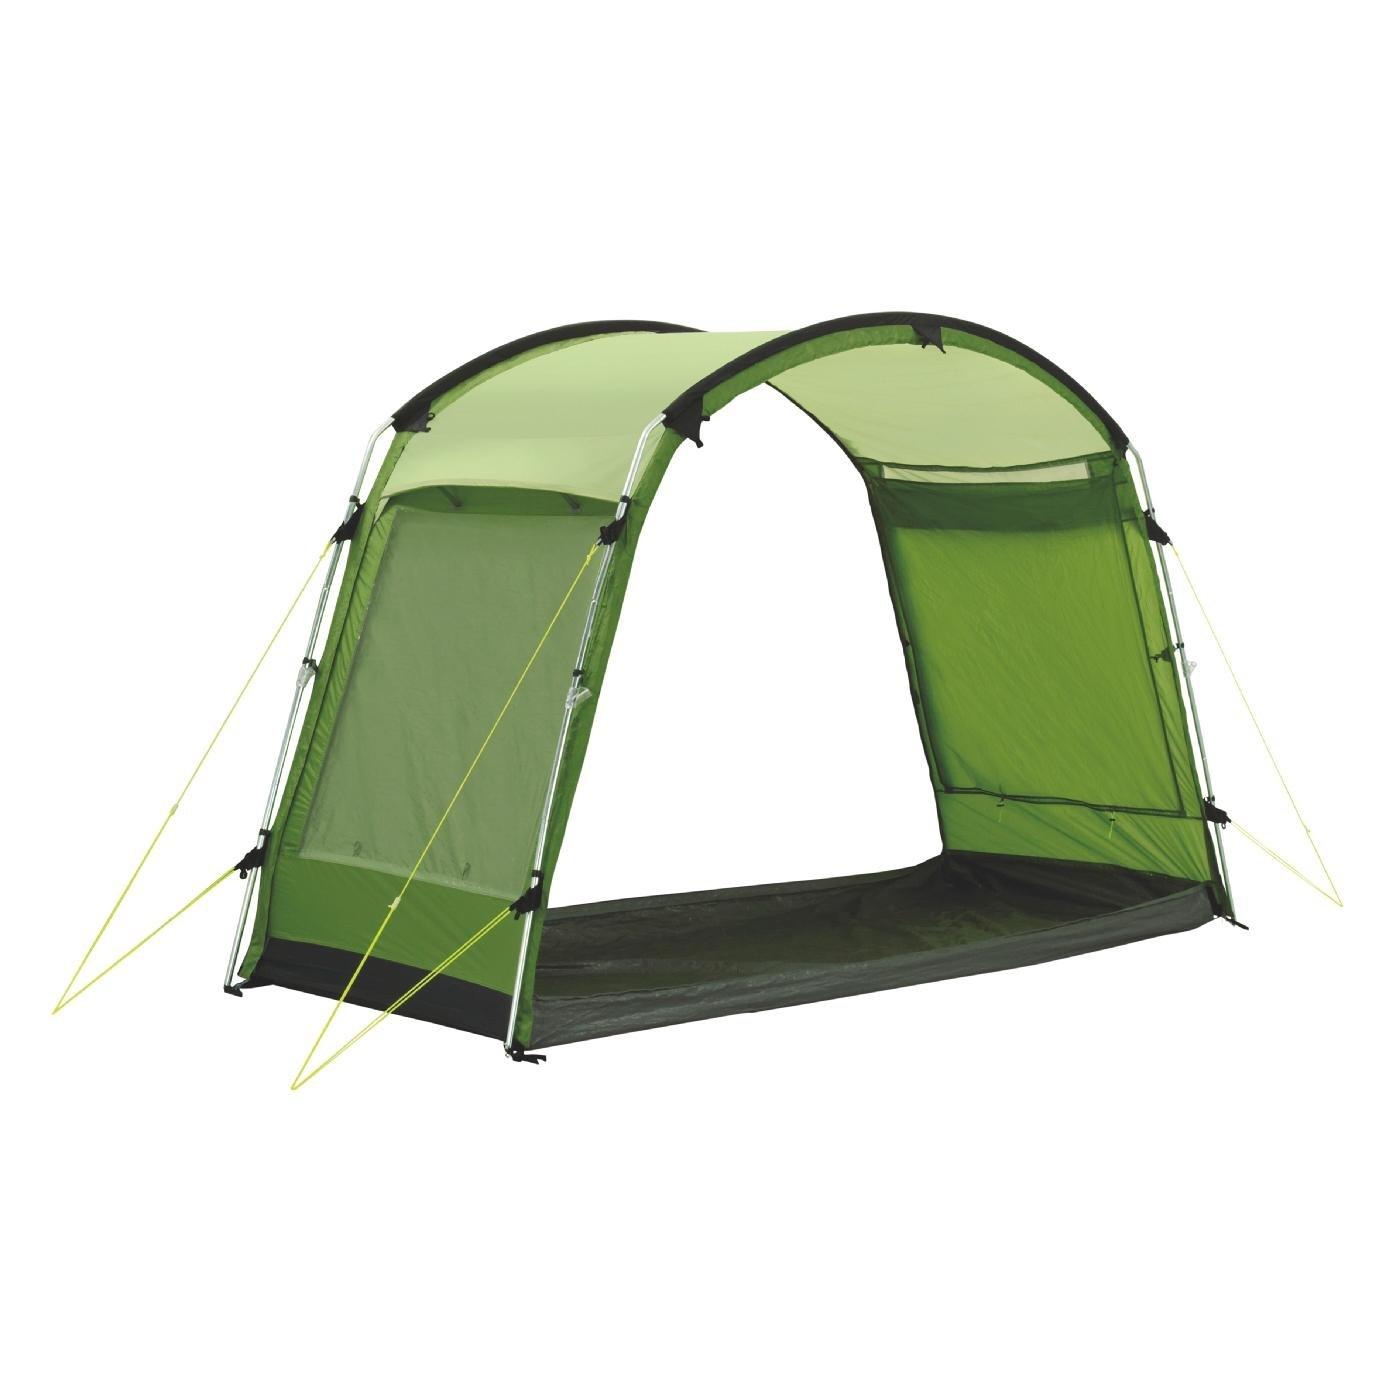 Outwell Campingbedarf Single Erweiterung für Zelt Malibu 5, 37348